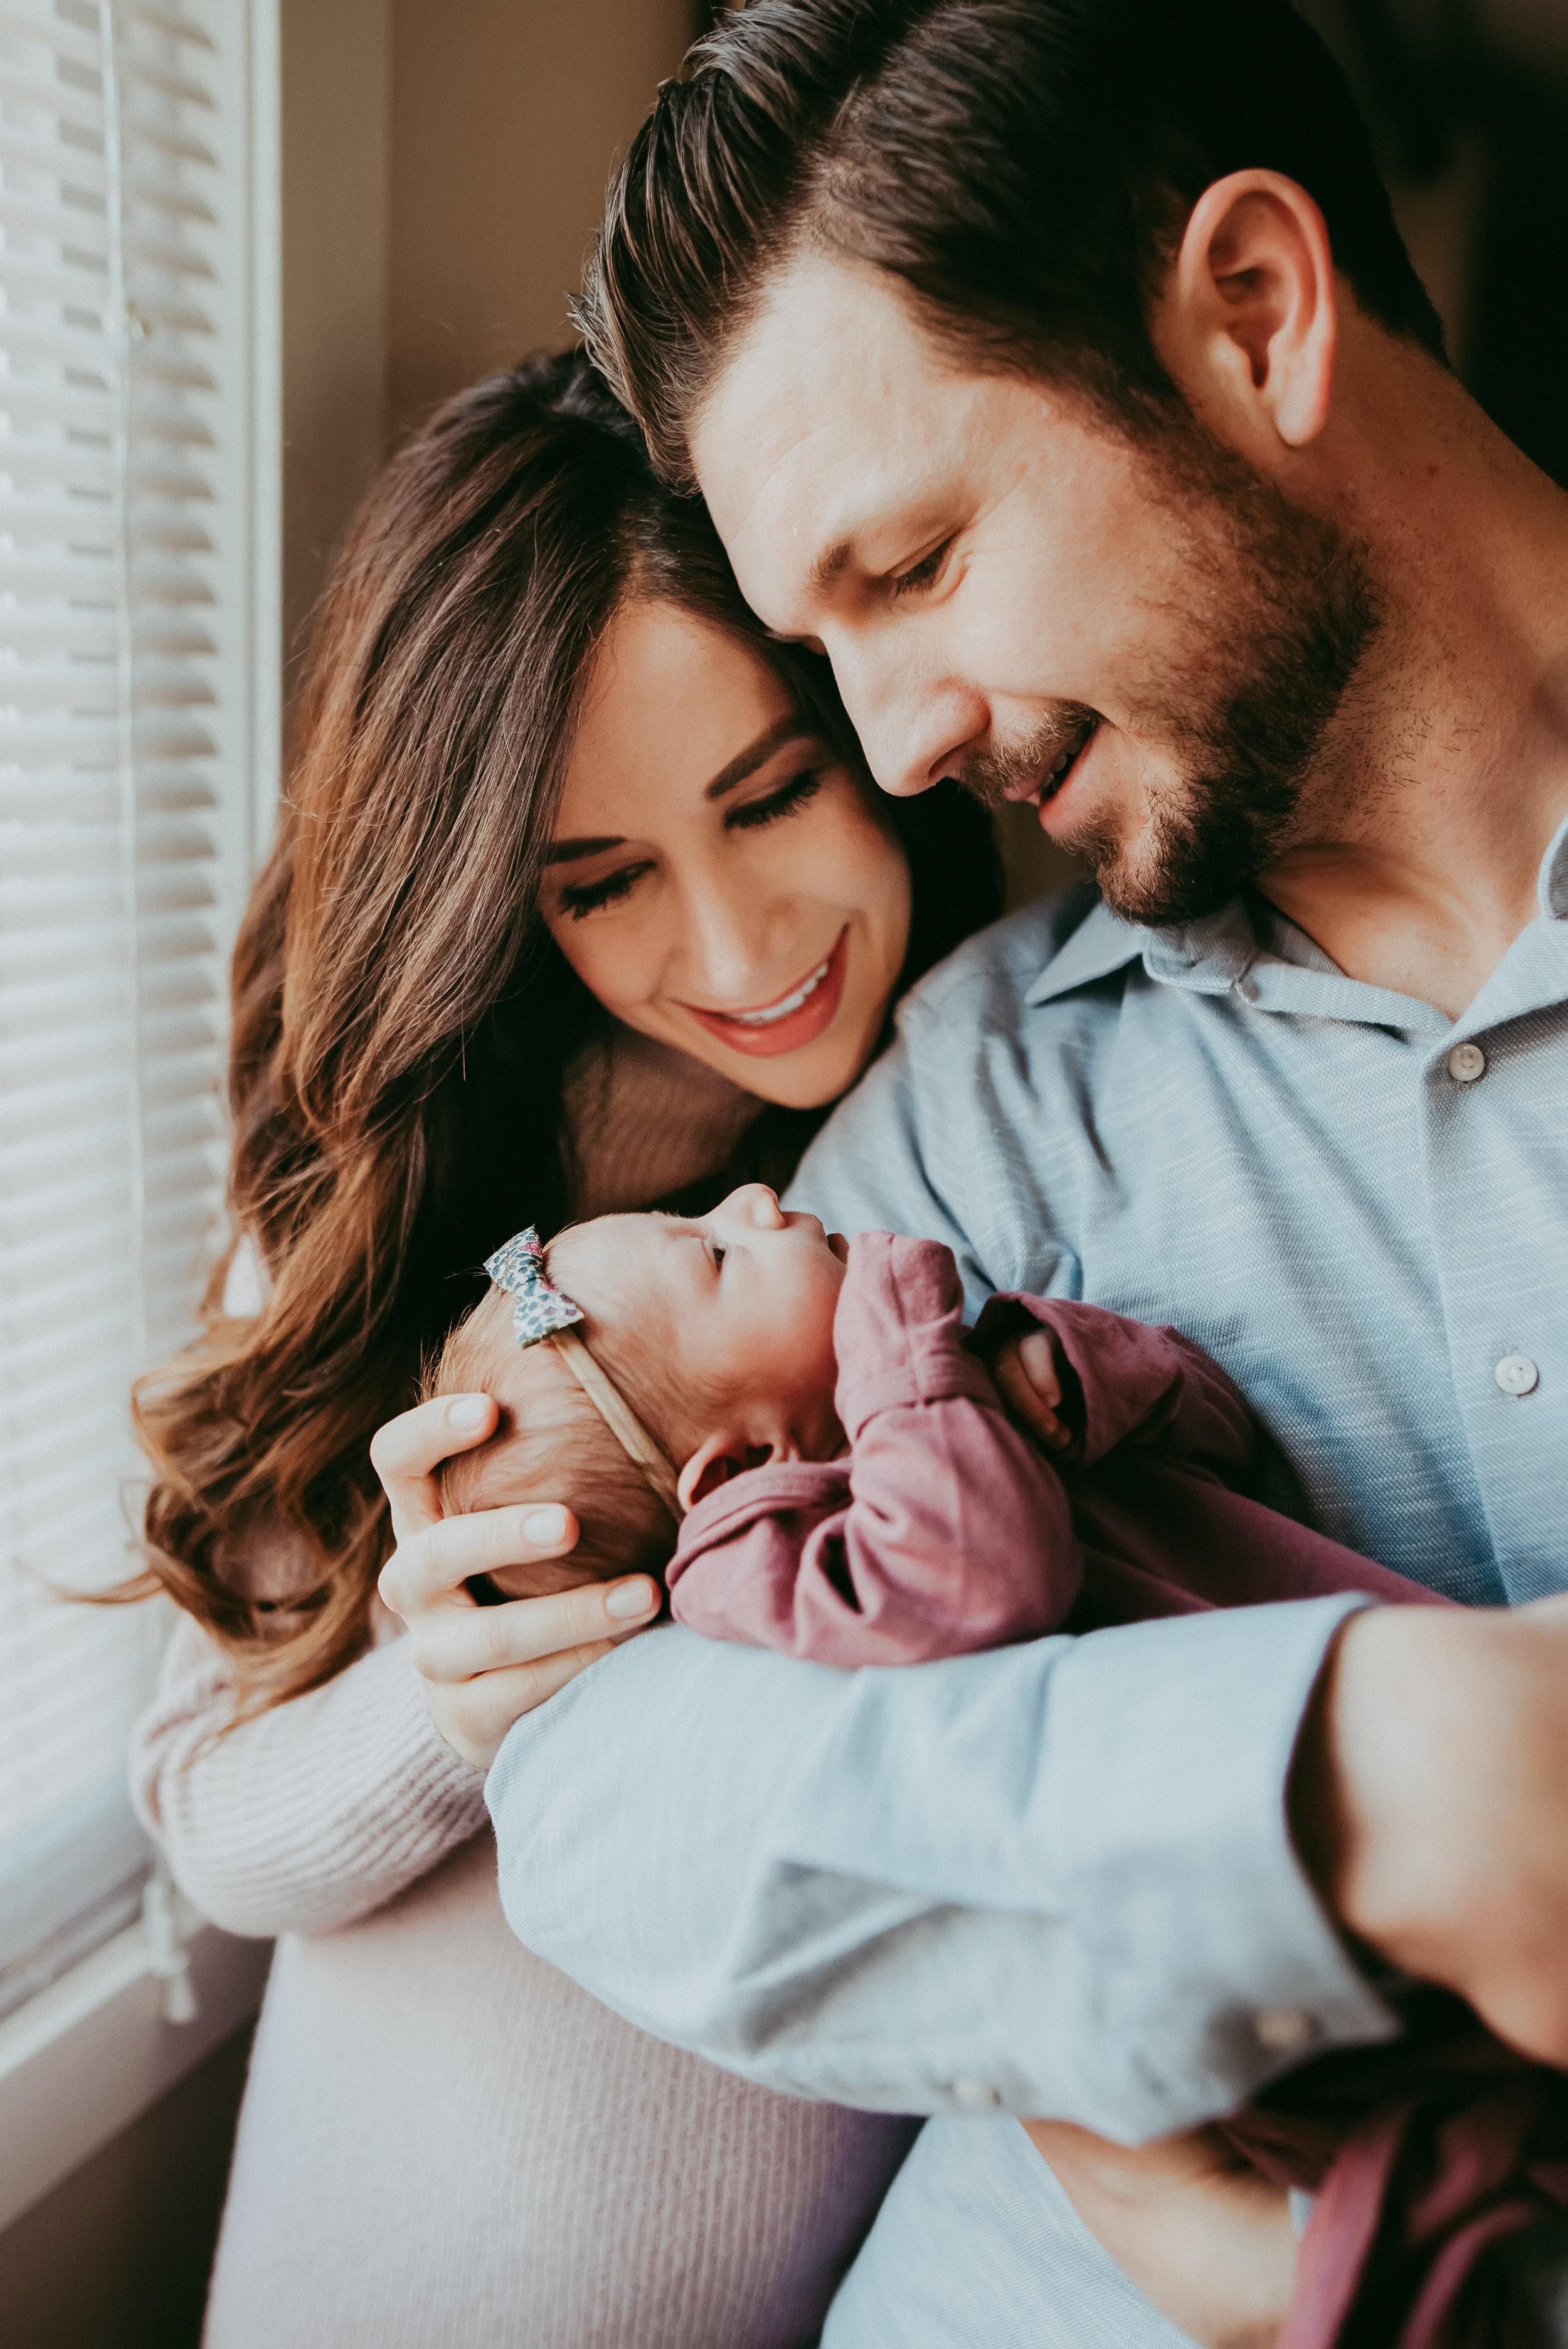 BabyCharlotte_StoriedPhotography-27.jpg